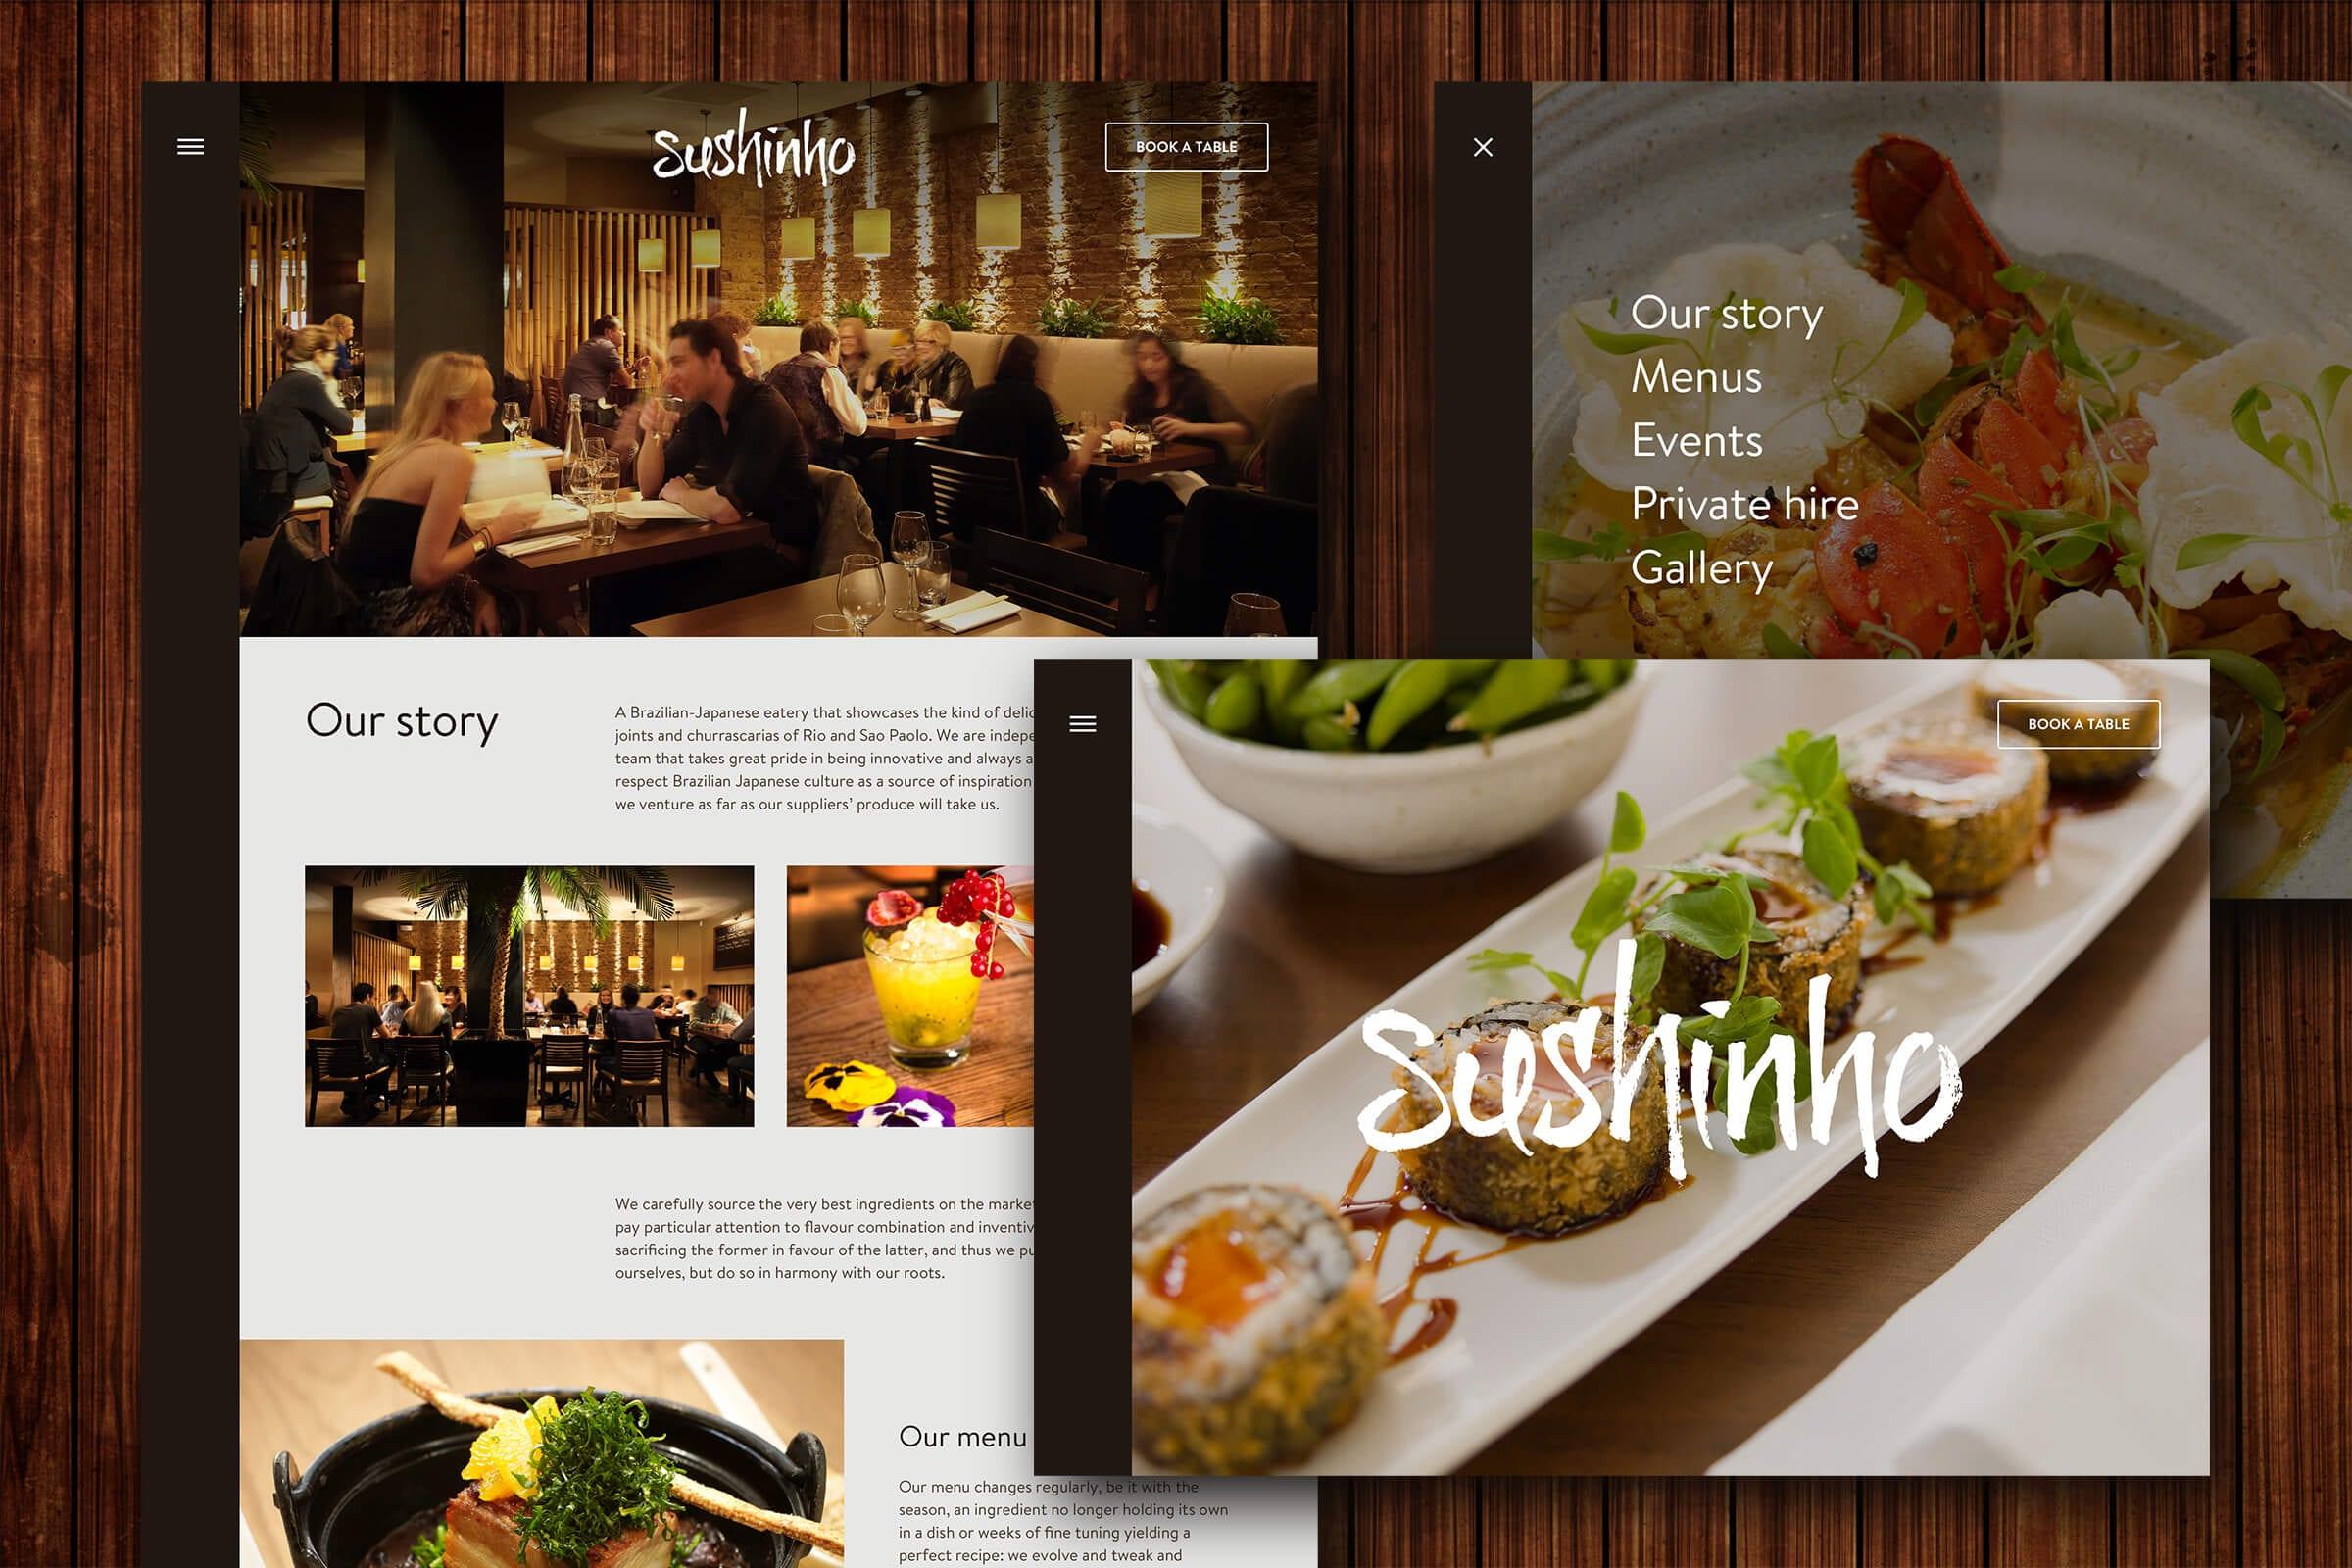 Sushinho website screenshots